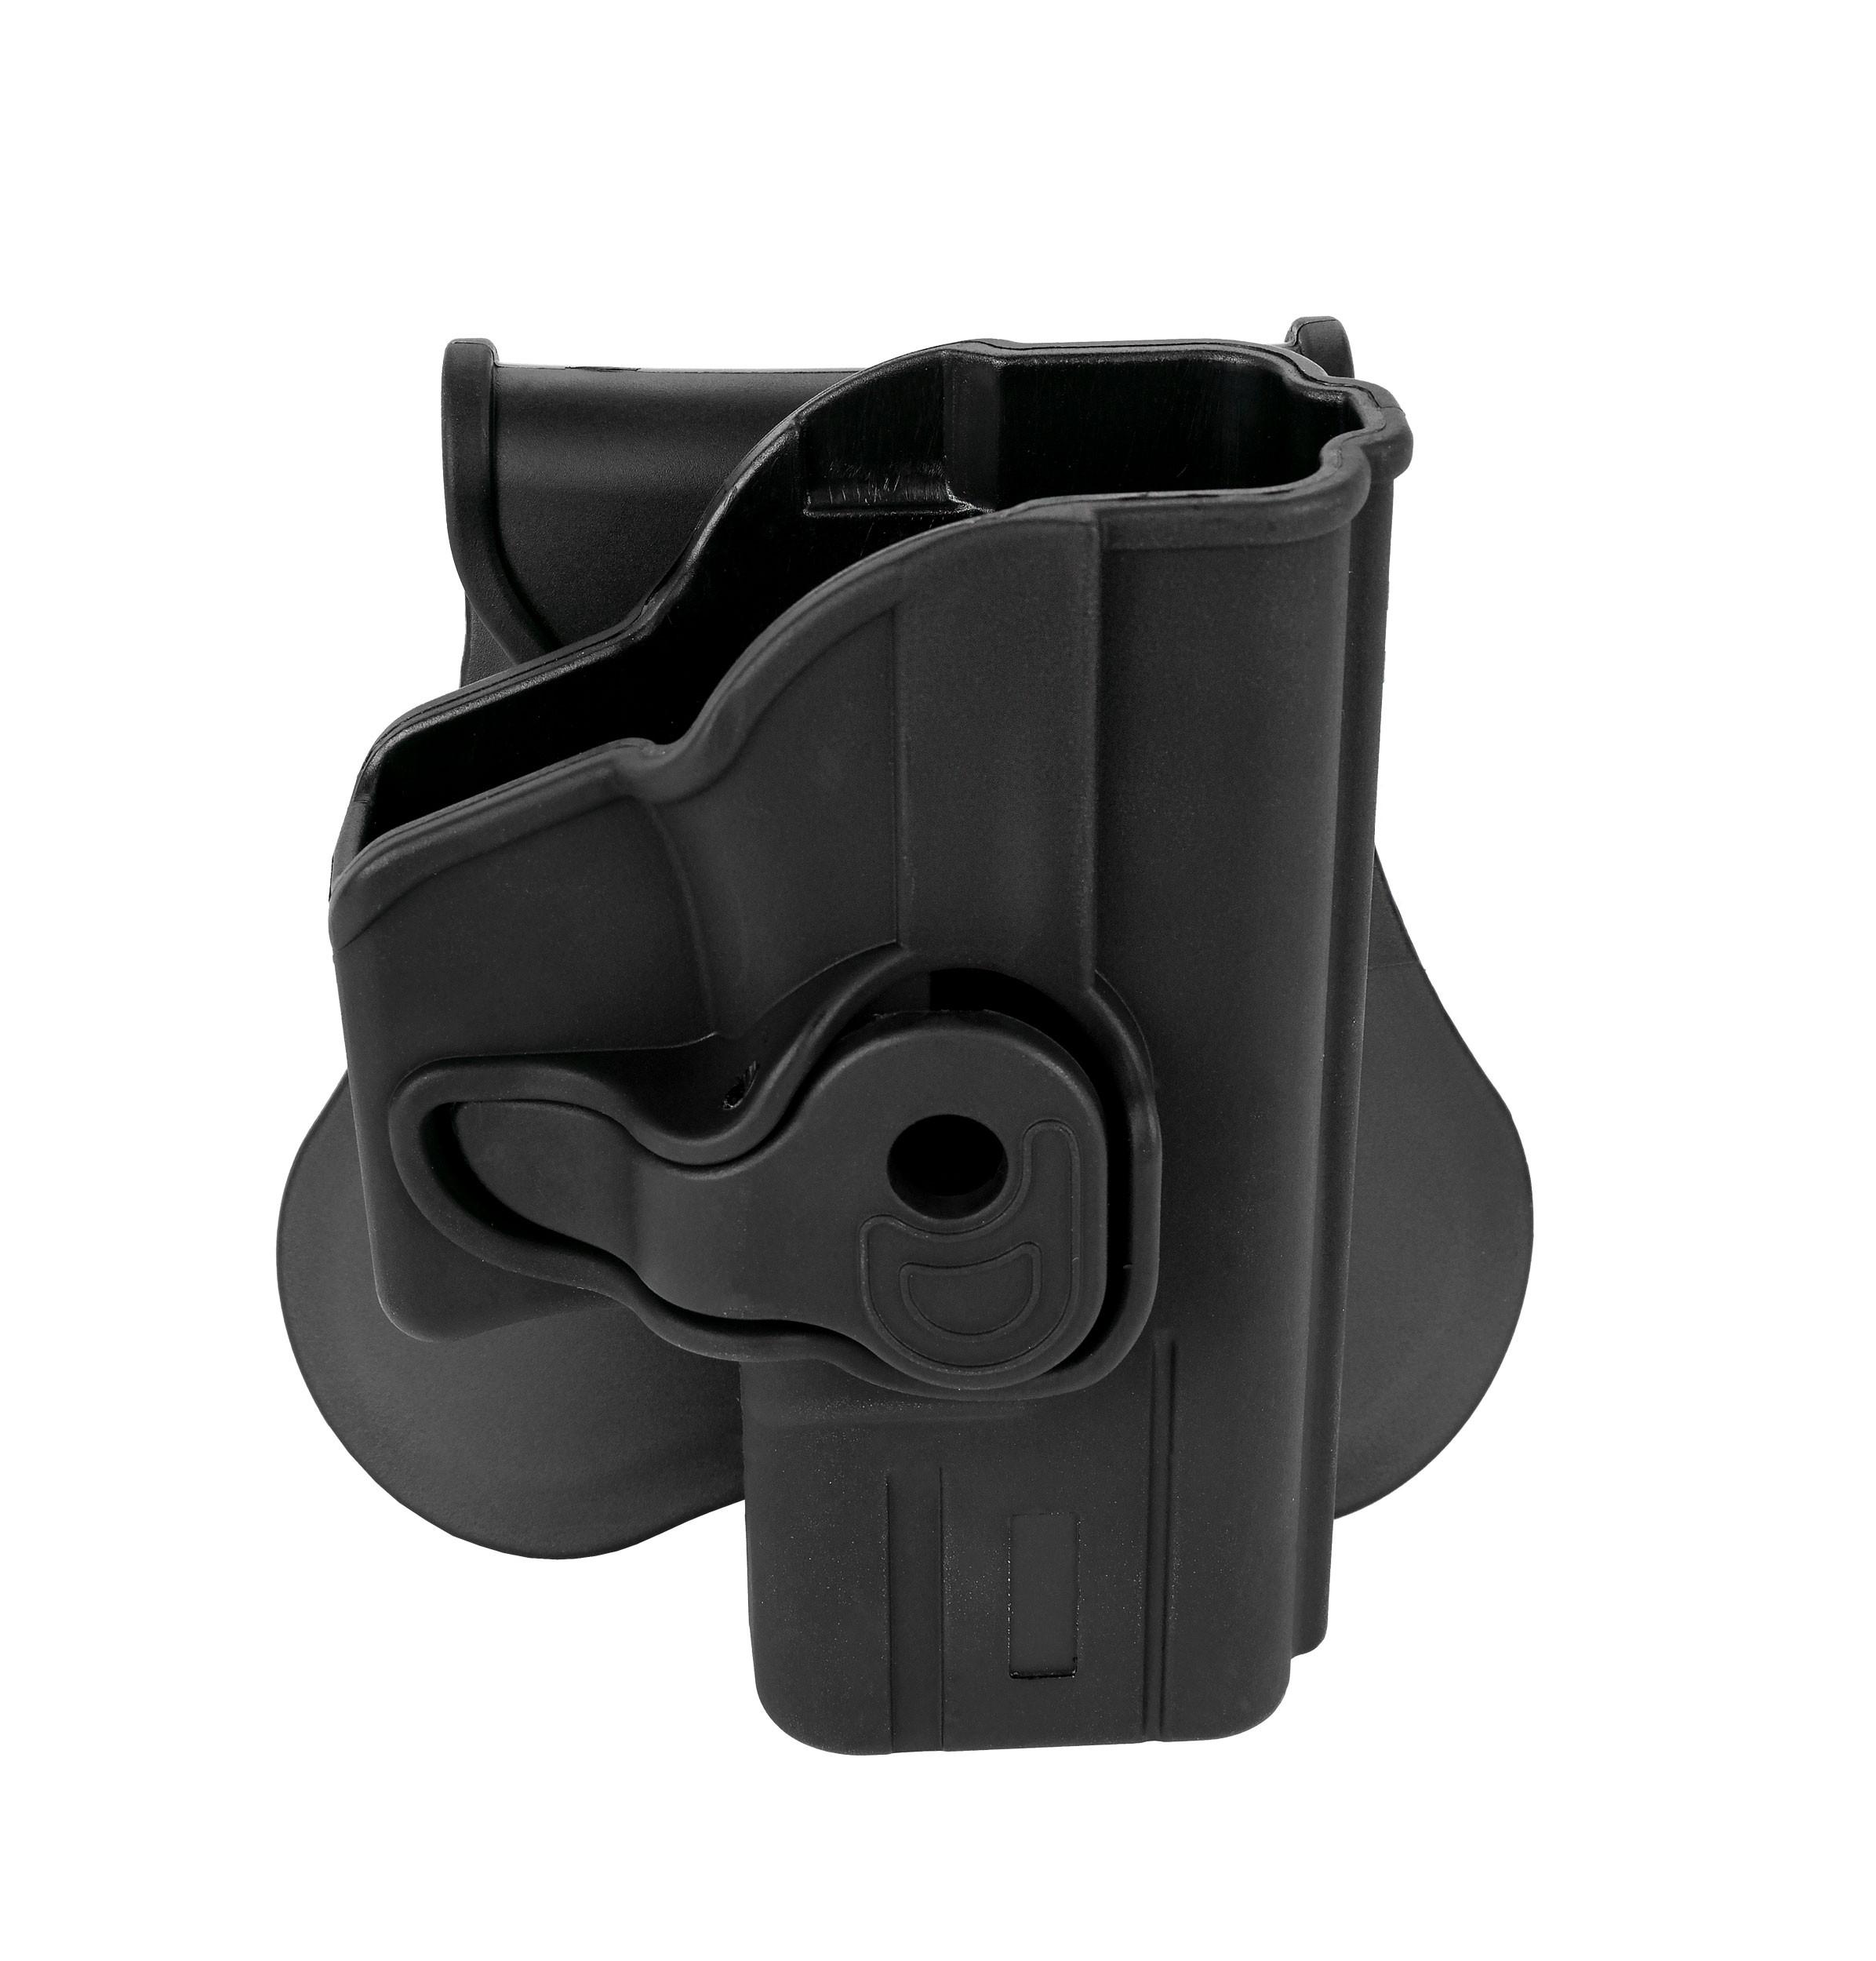 Fits Glock 26, 27, 33 (Gen 1,2,3,4) Holster